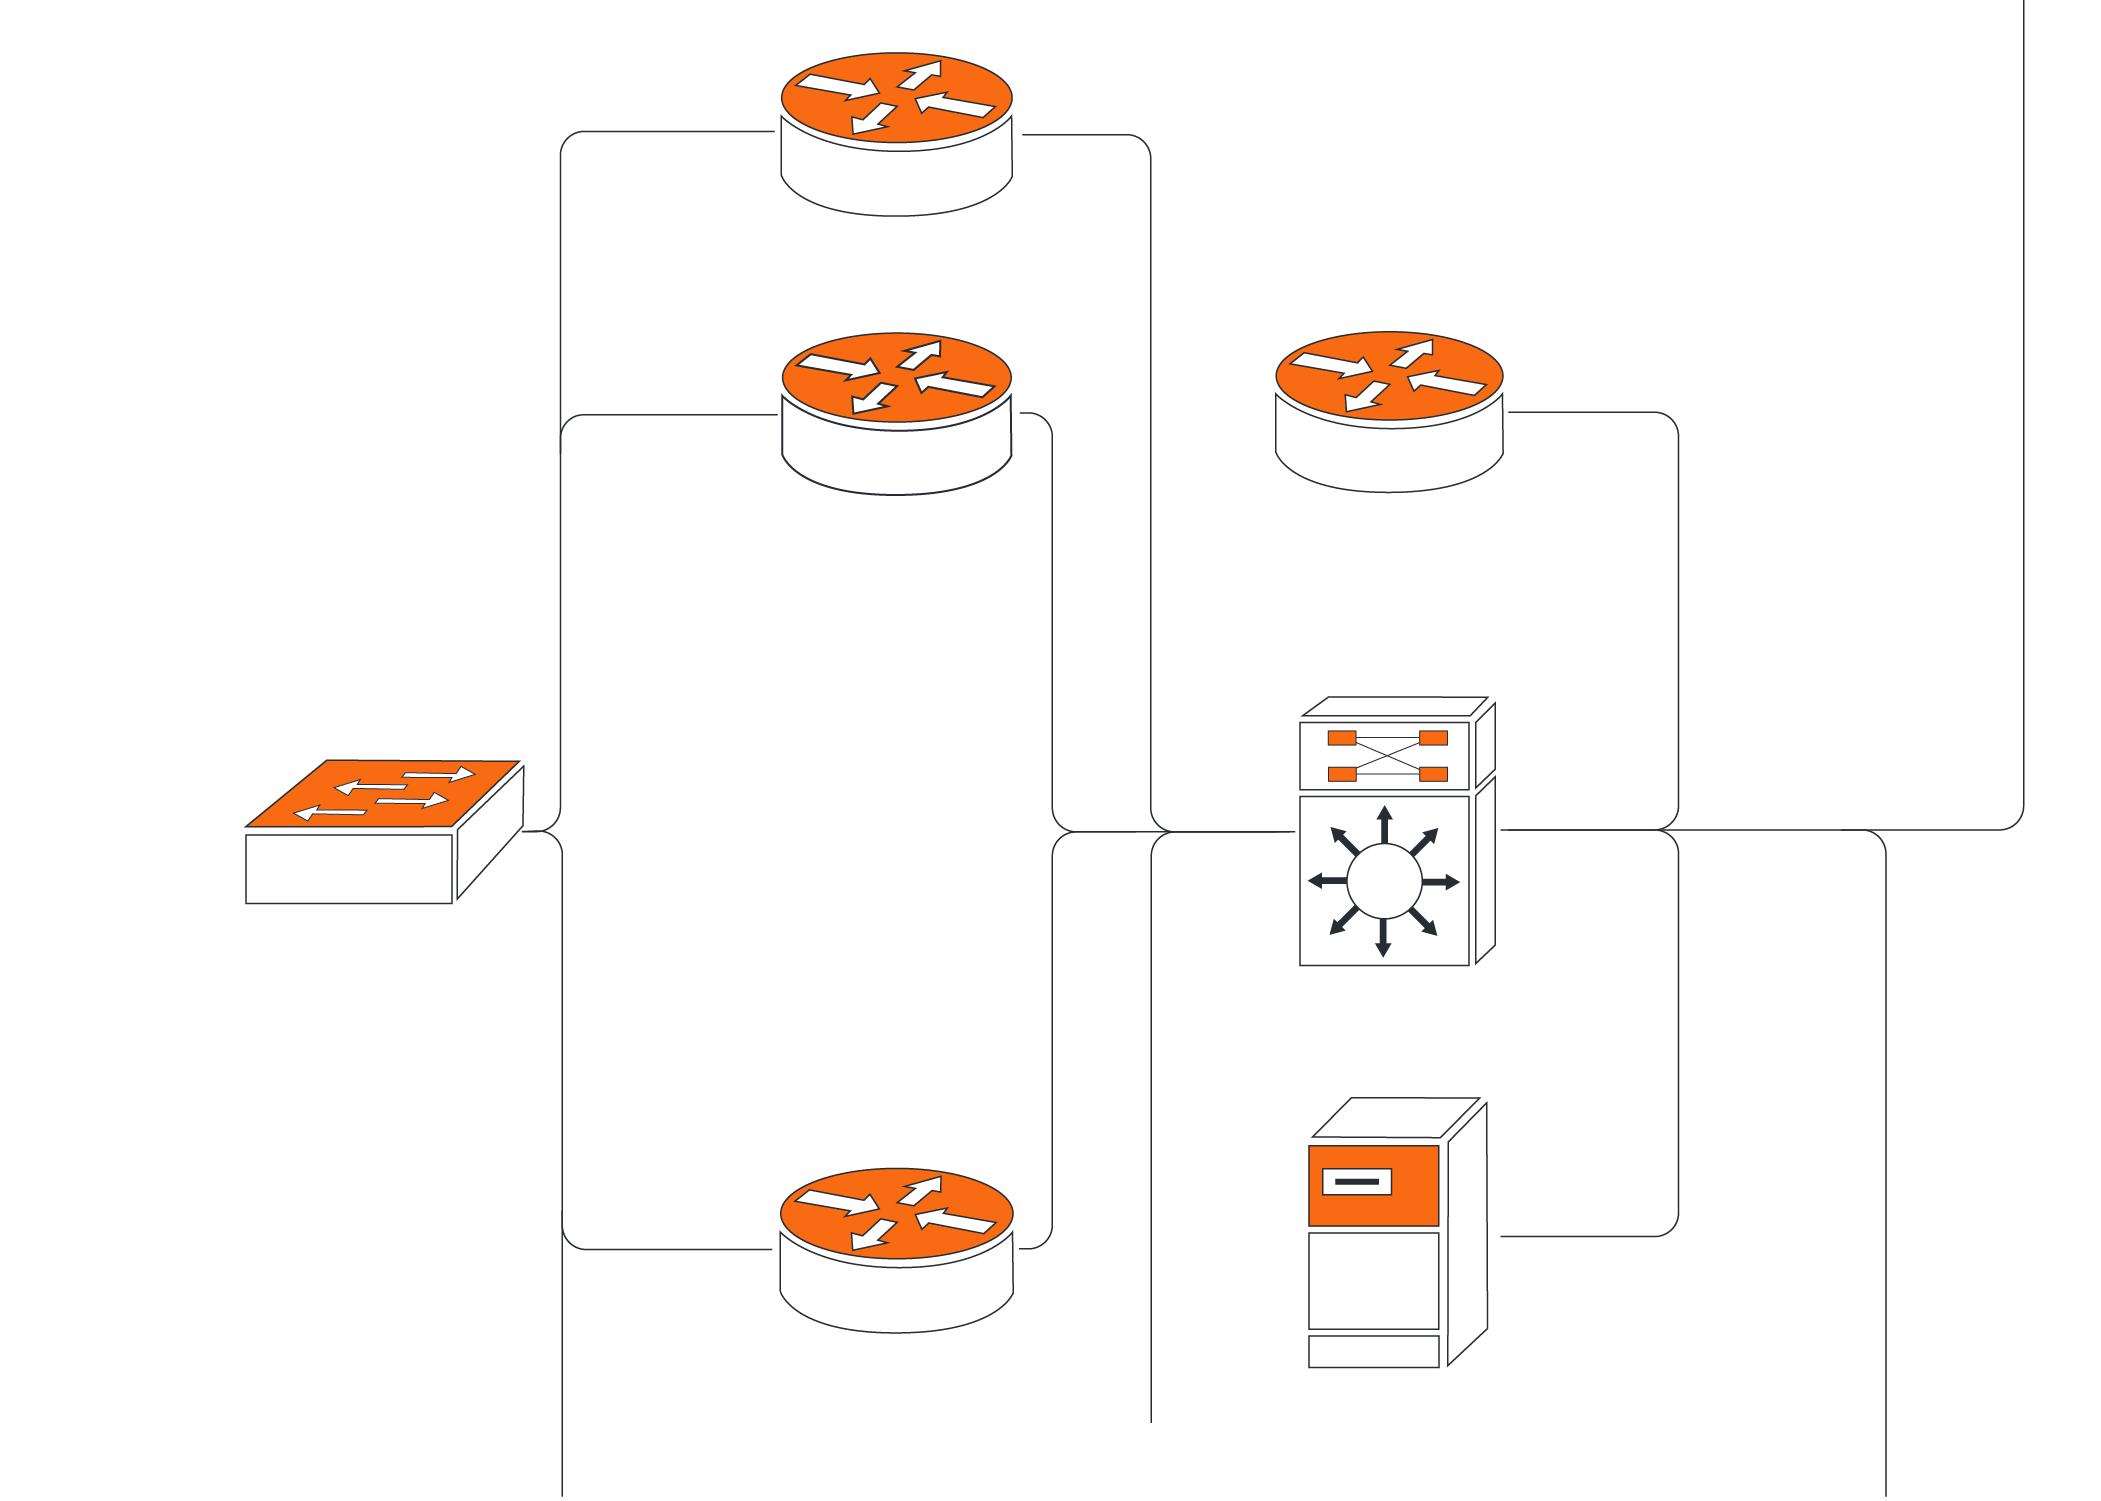 logiciel de schéma de baie de brassage